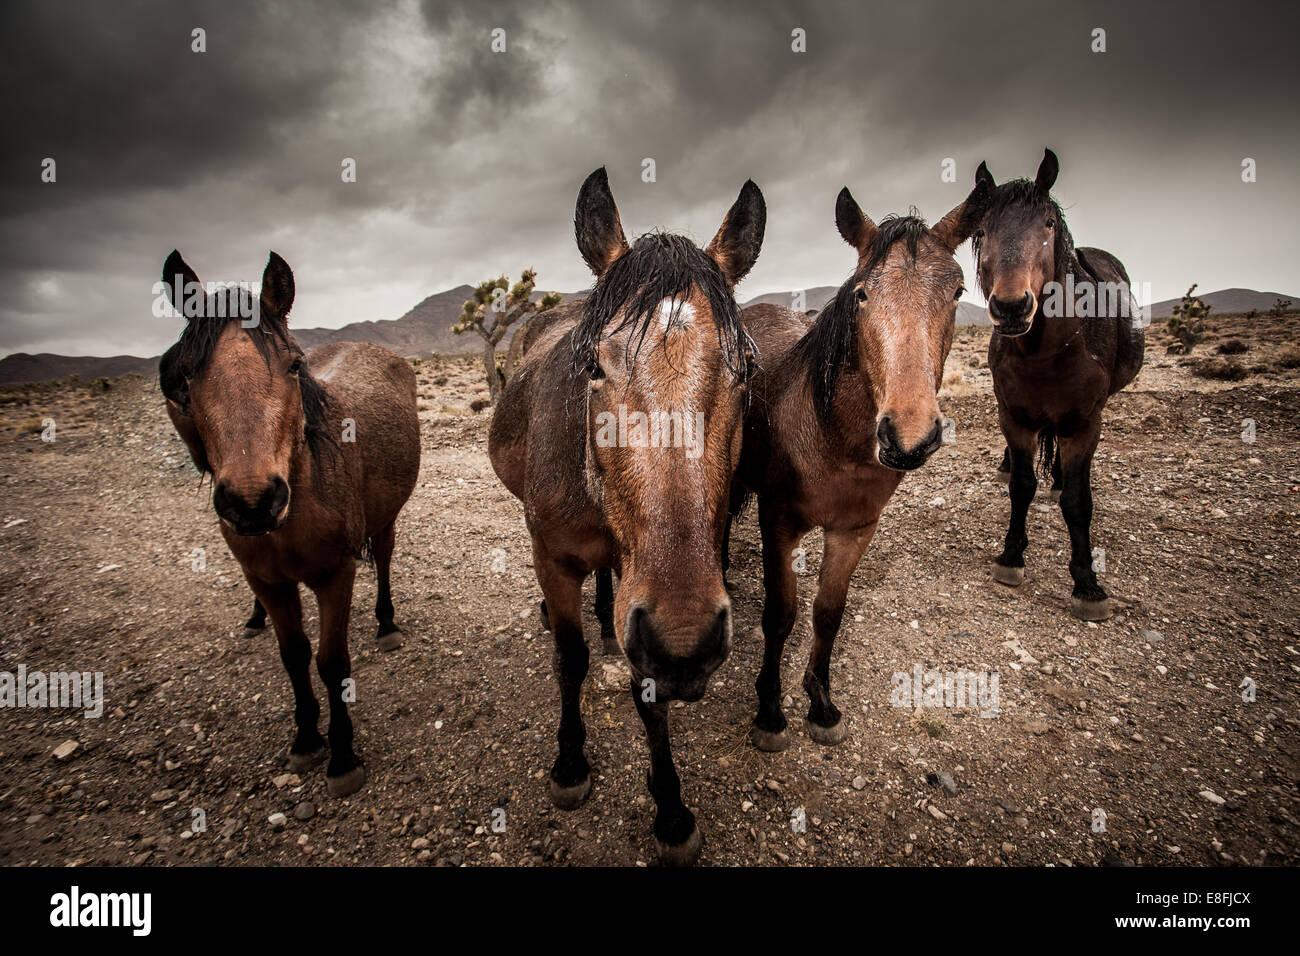 Portrait of herd of horses - Stock Image